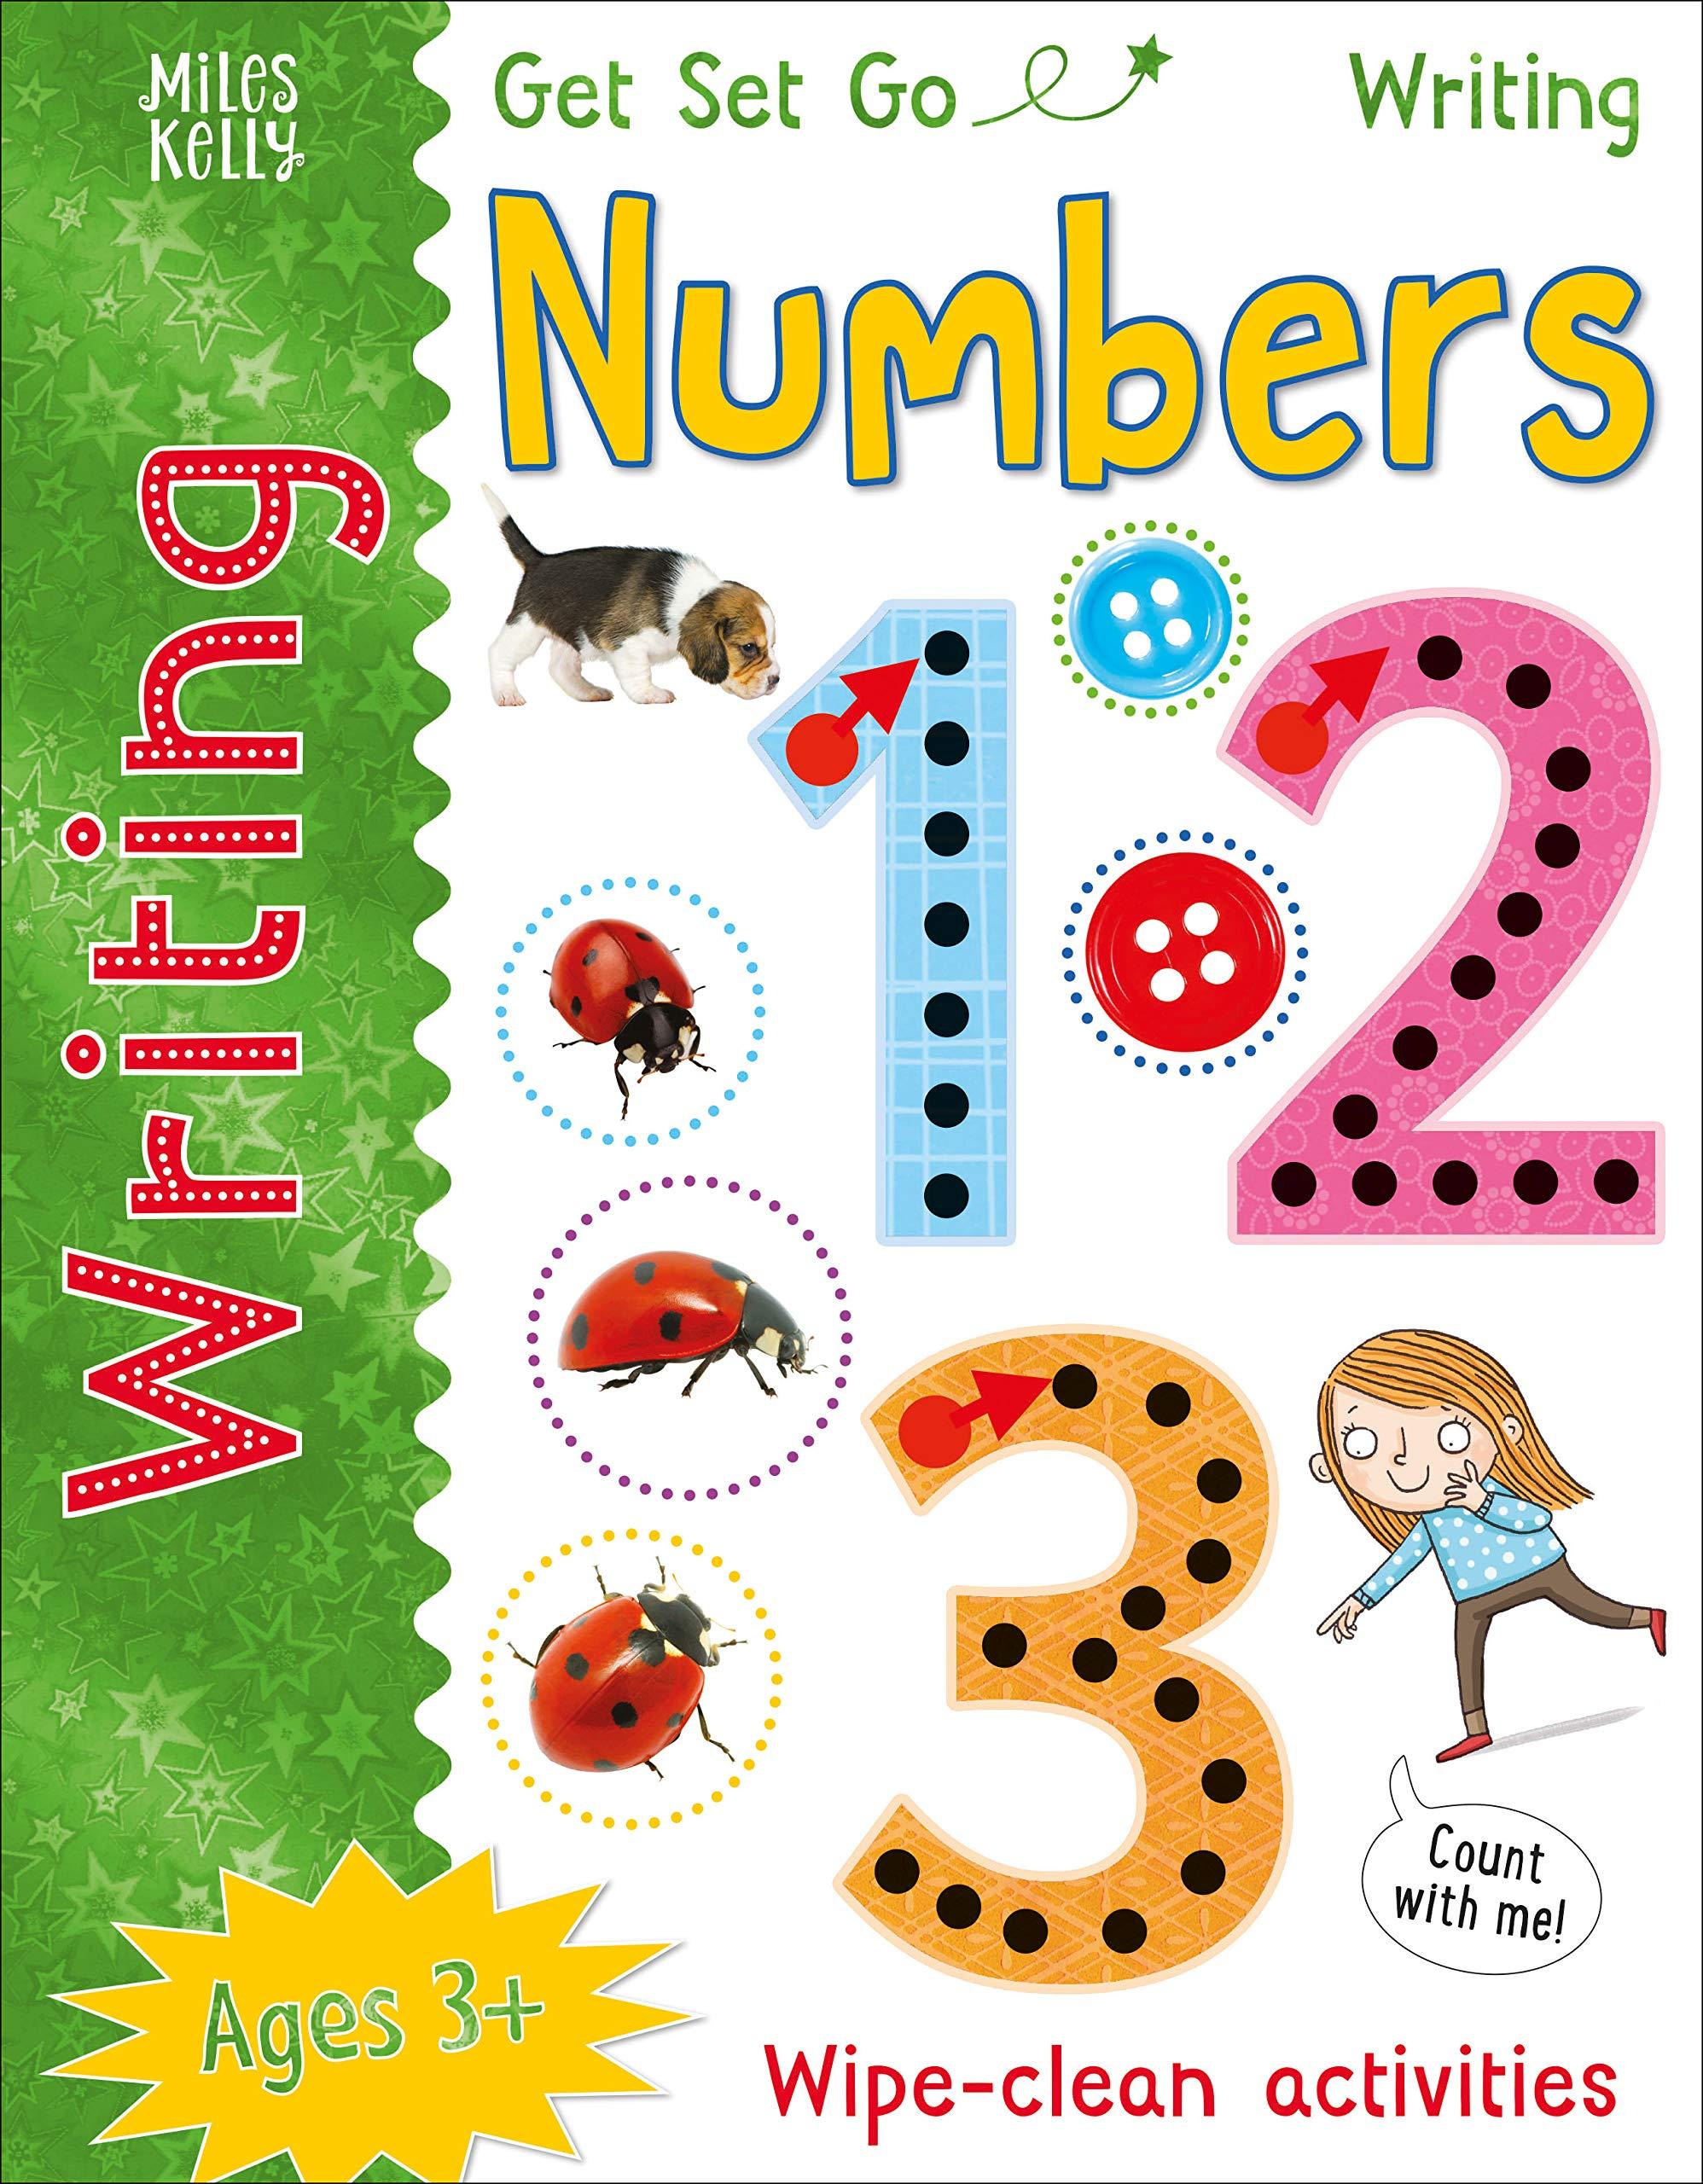 GSG WRITING NUMBERS (GET SET GO WRITING)